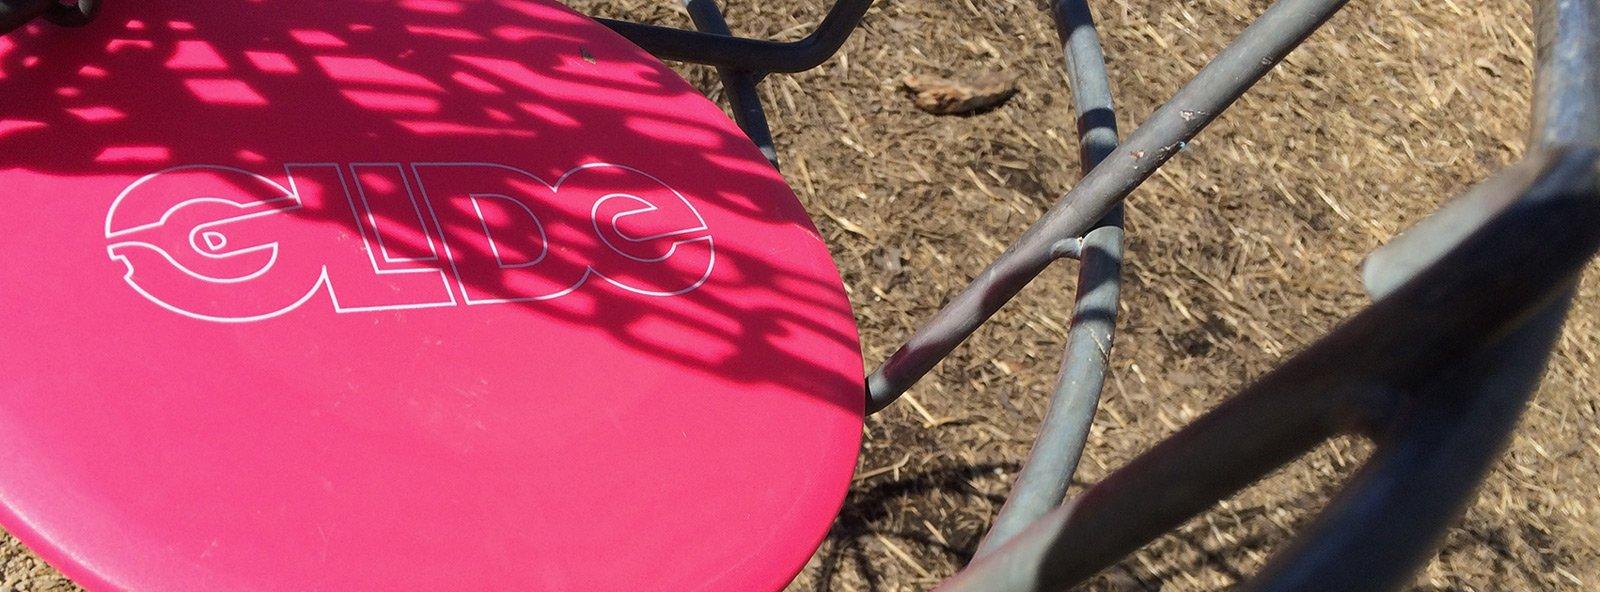 Phonographik Design Studio – Glide disc stamp